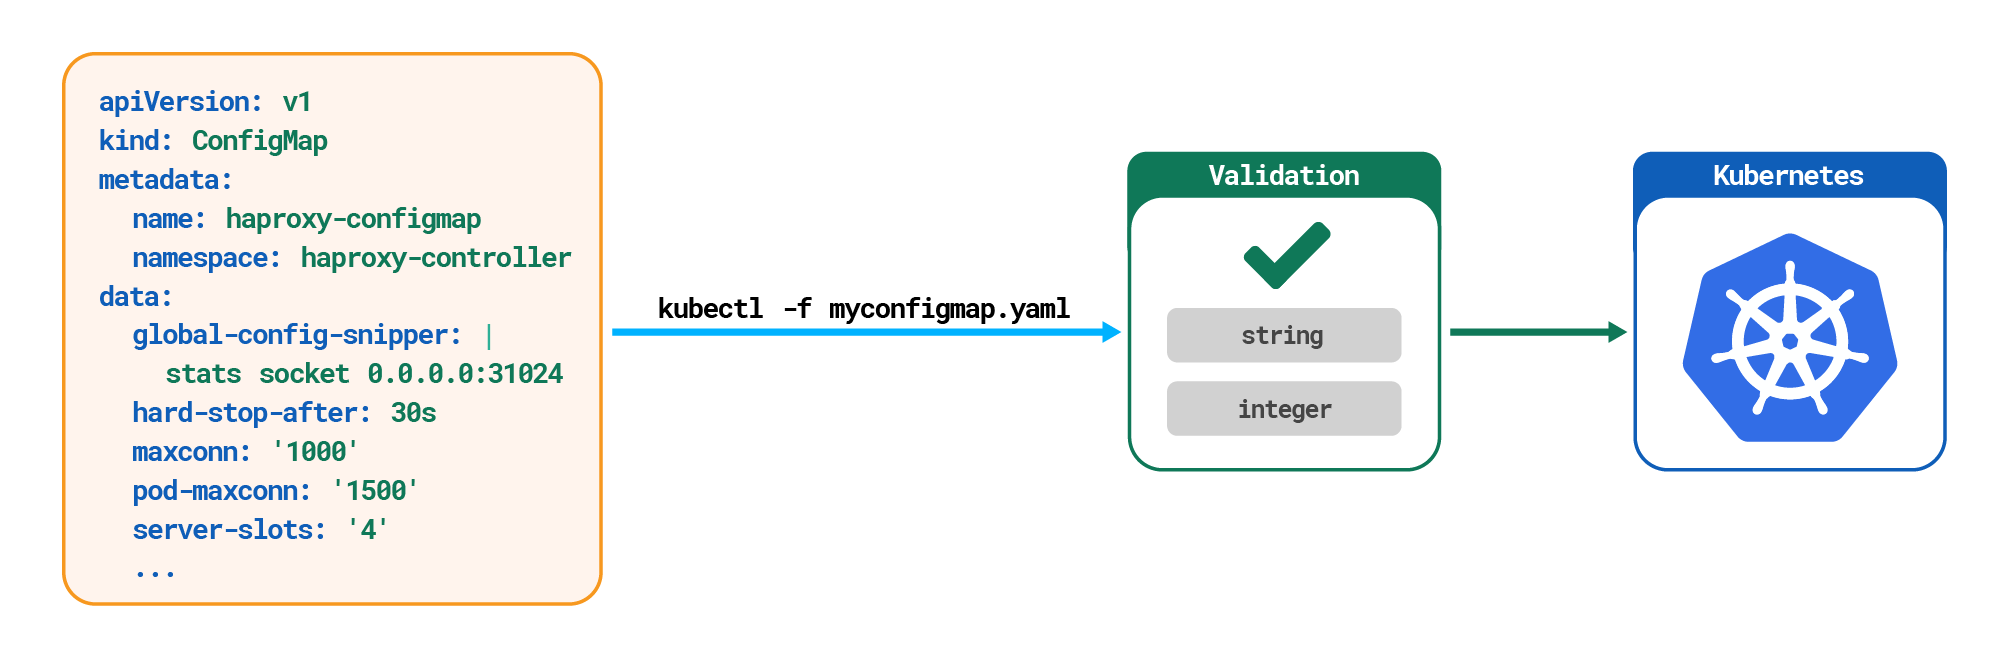 ConfigMap validation